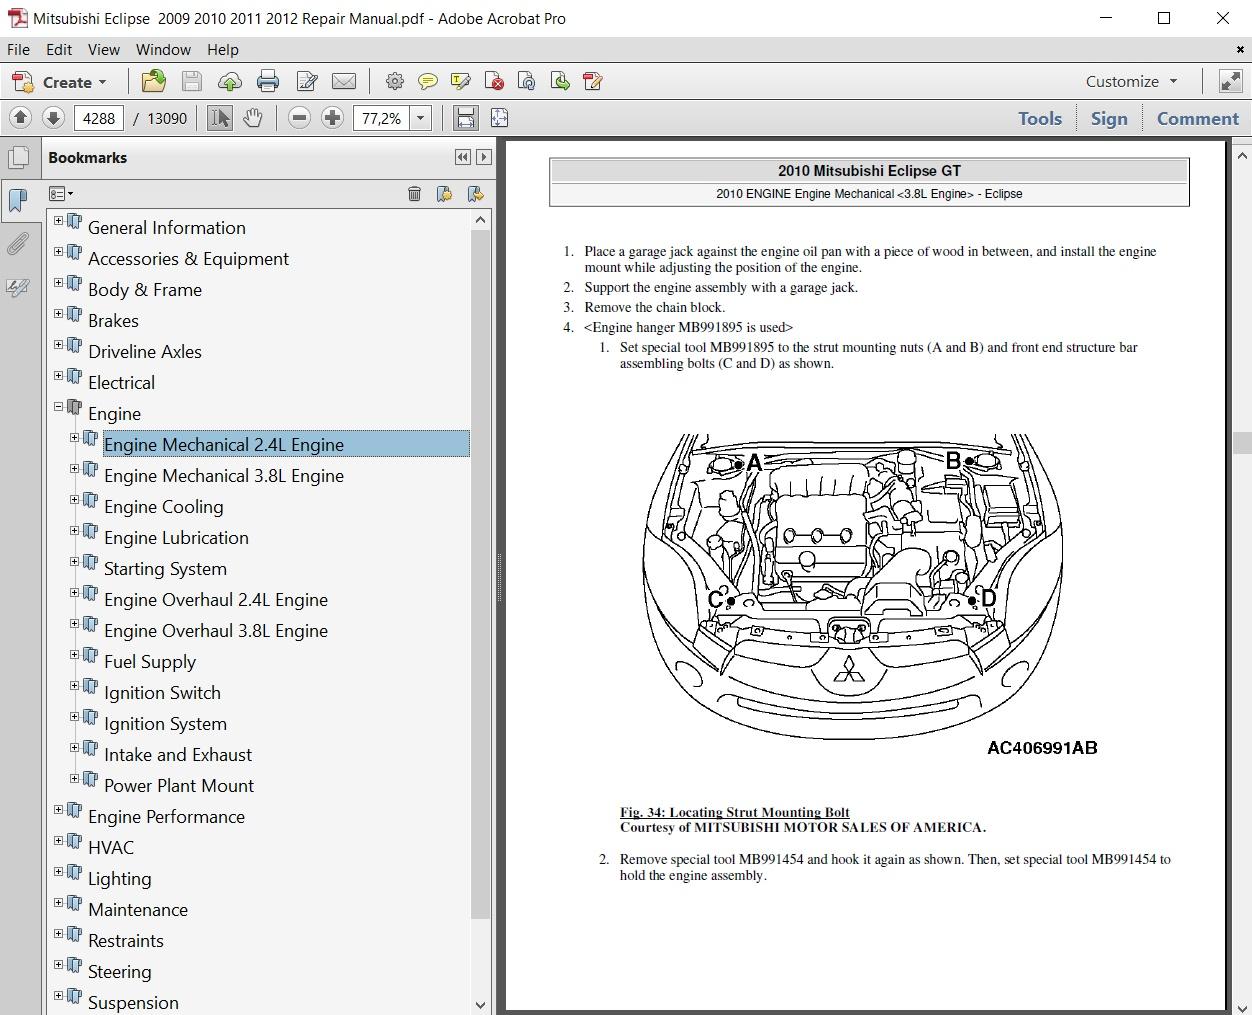 2011 Eclipse Engine Diagram Schematics Mitsubishi 2009 2010 2012 Repair Manual Lunar